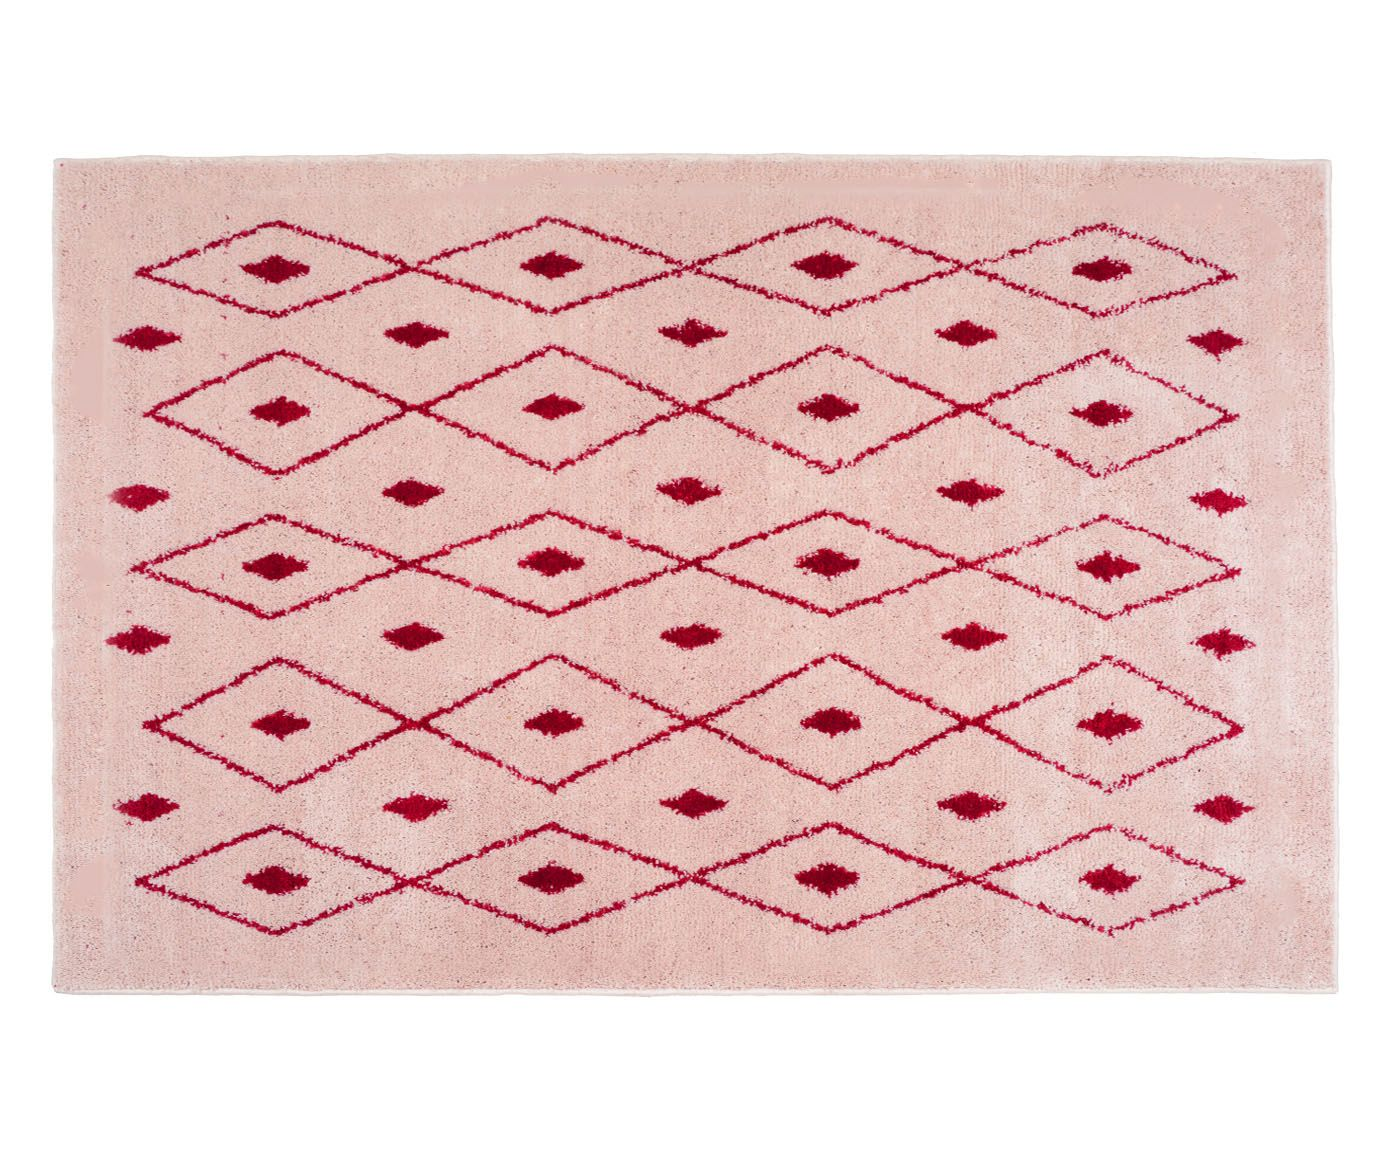 Tapete Art Kahina Pérola e Rubi - 200X300cm, 200x300cm | Westwing.com.br